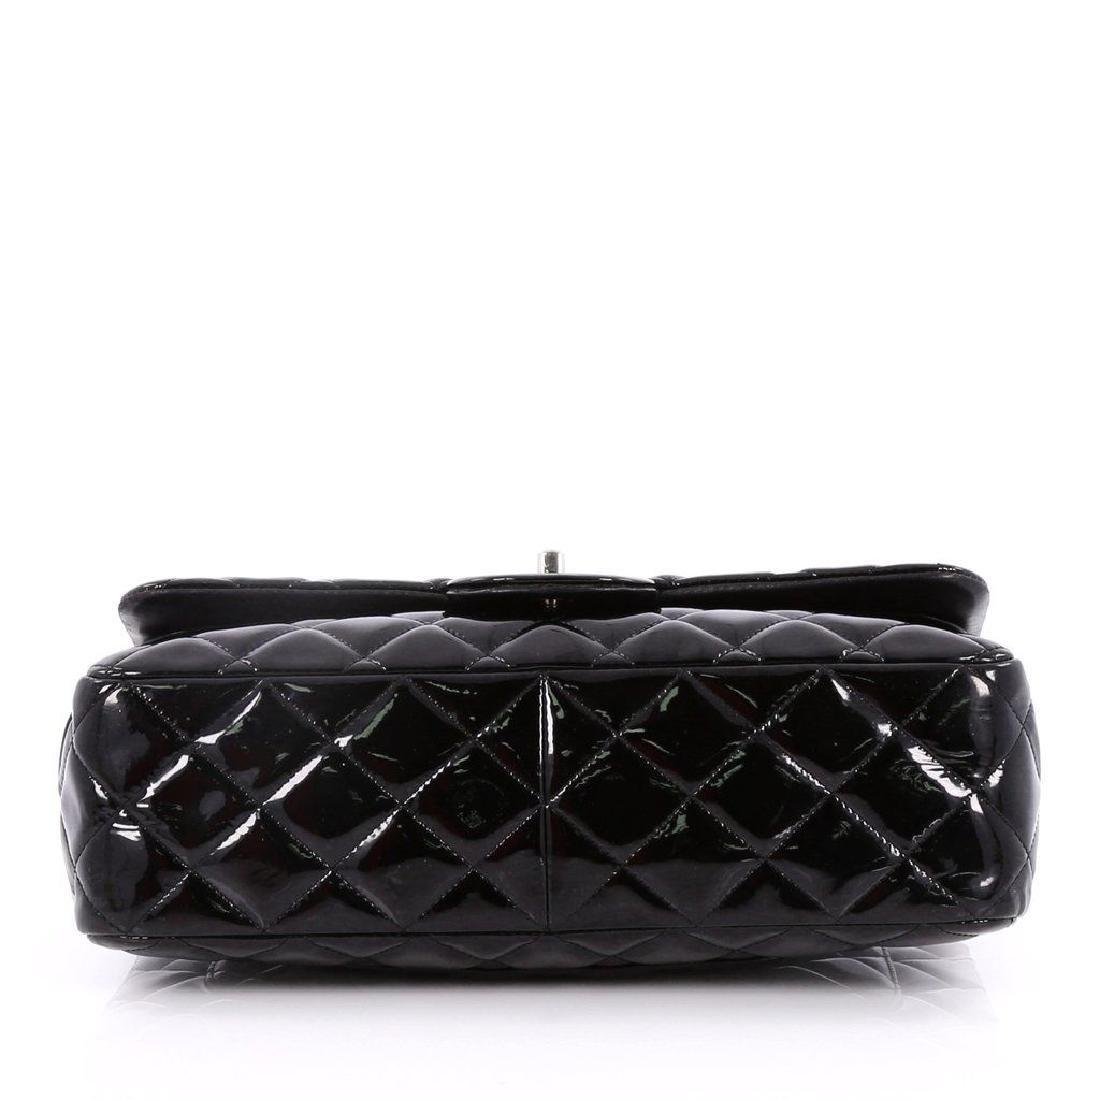 Classic Double Flap Jumbo Maxi Black Patent Leather - 6